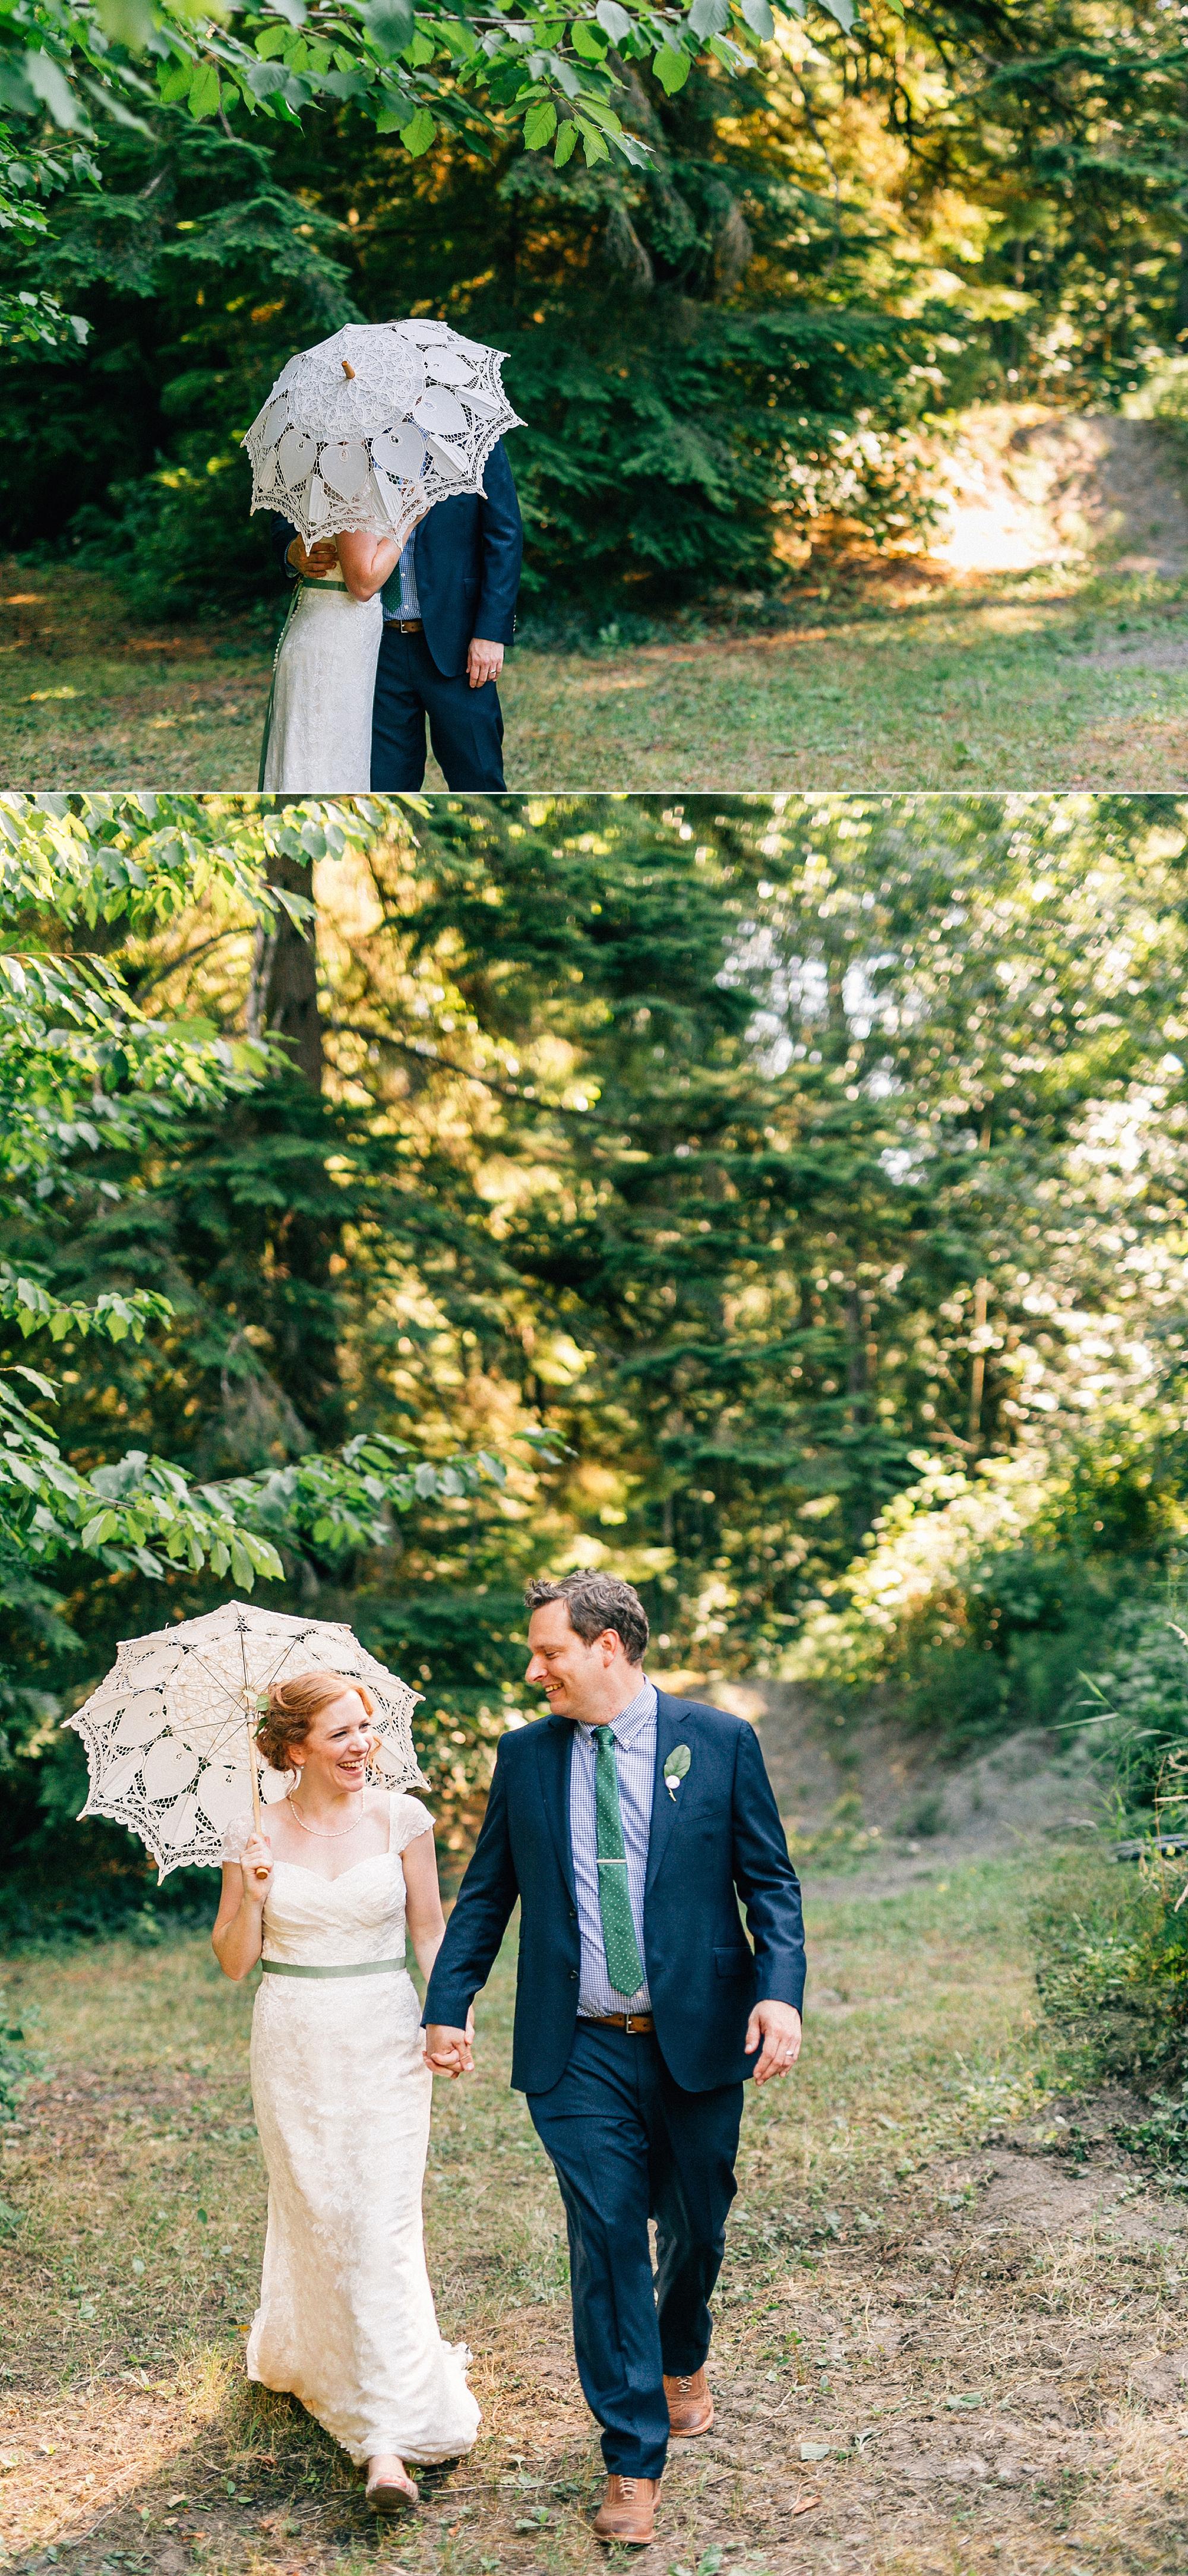 ashley vos photography seattle area wedding photographer_0708.jpg